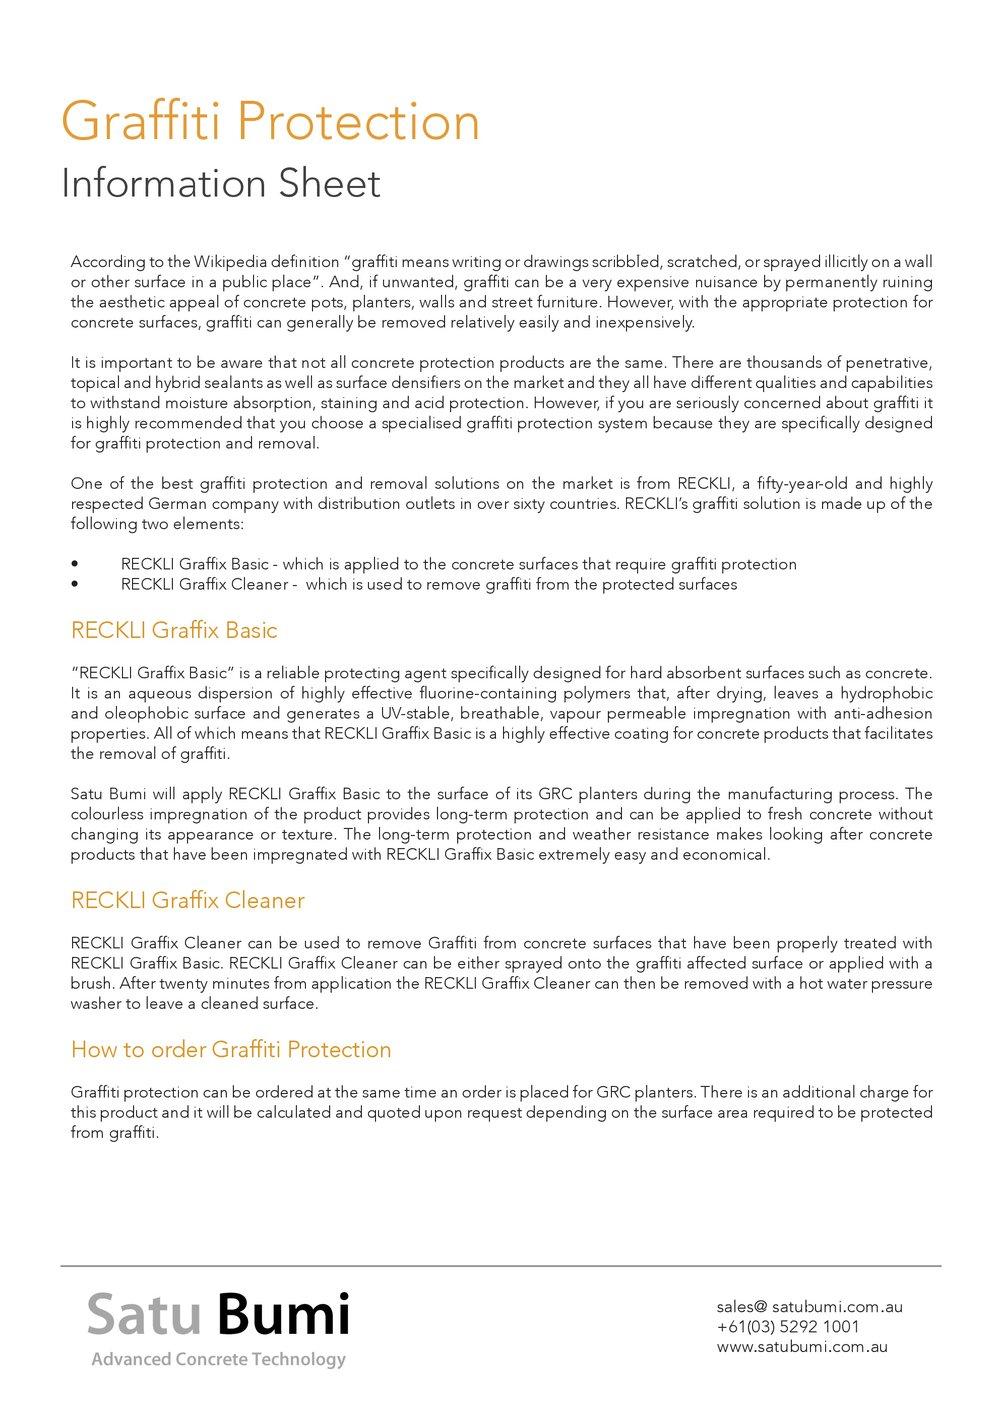 Graffiti Protection - Satu Bumi Information Sheet